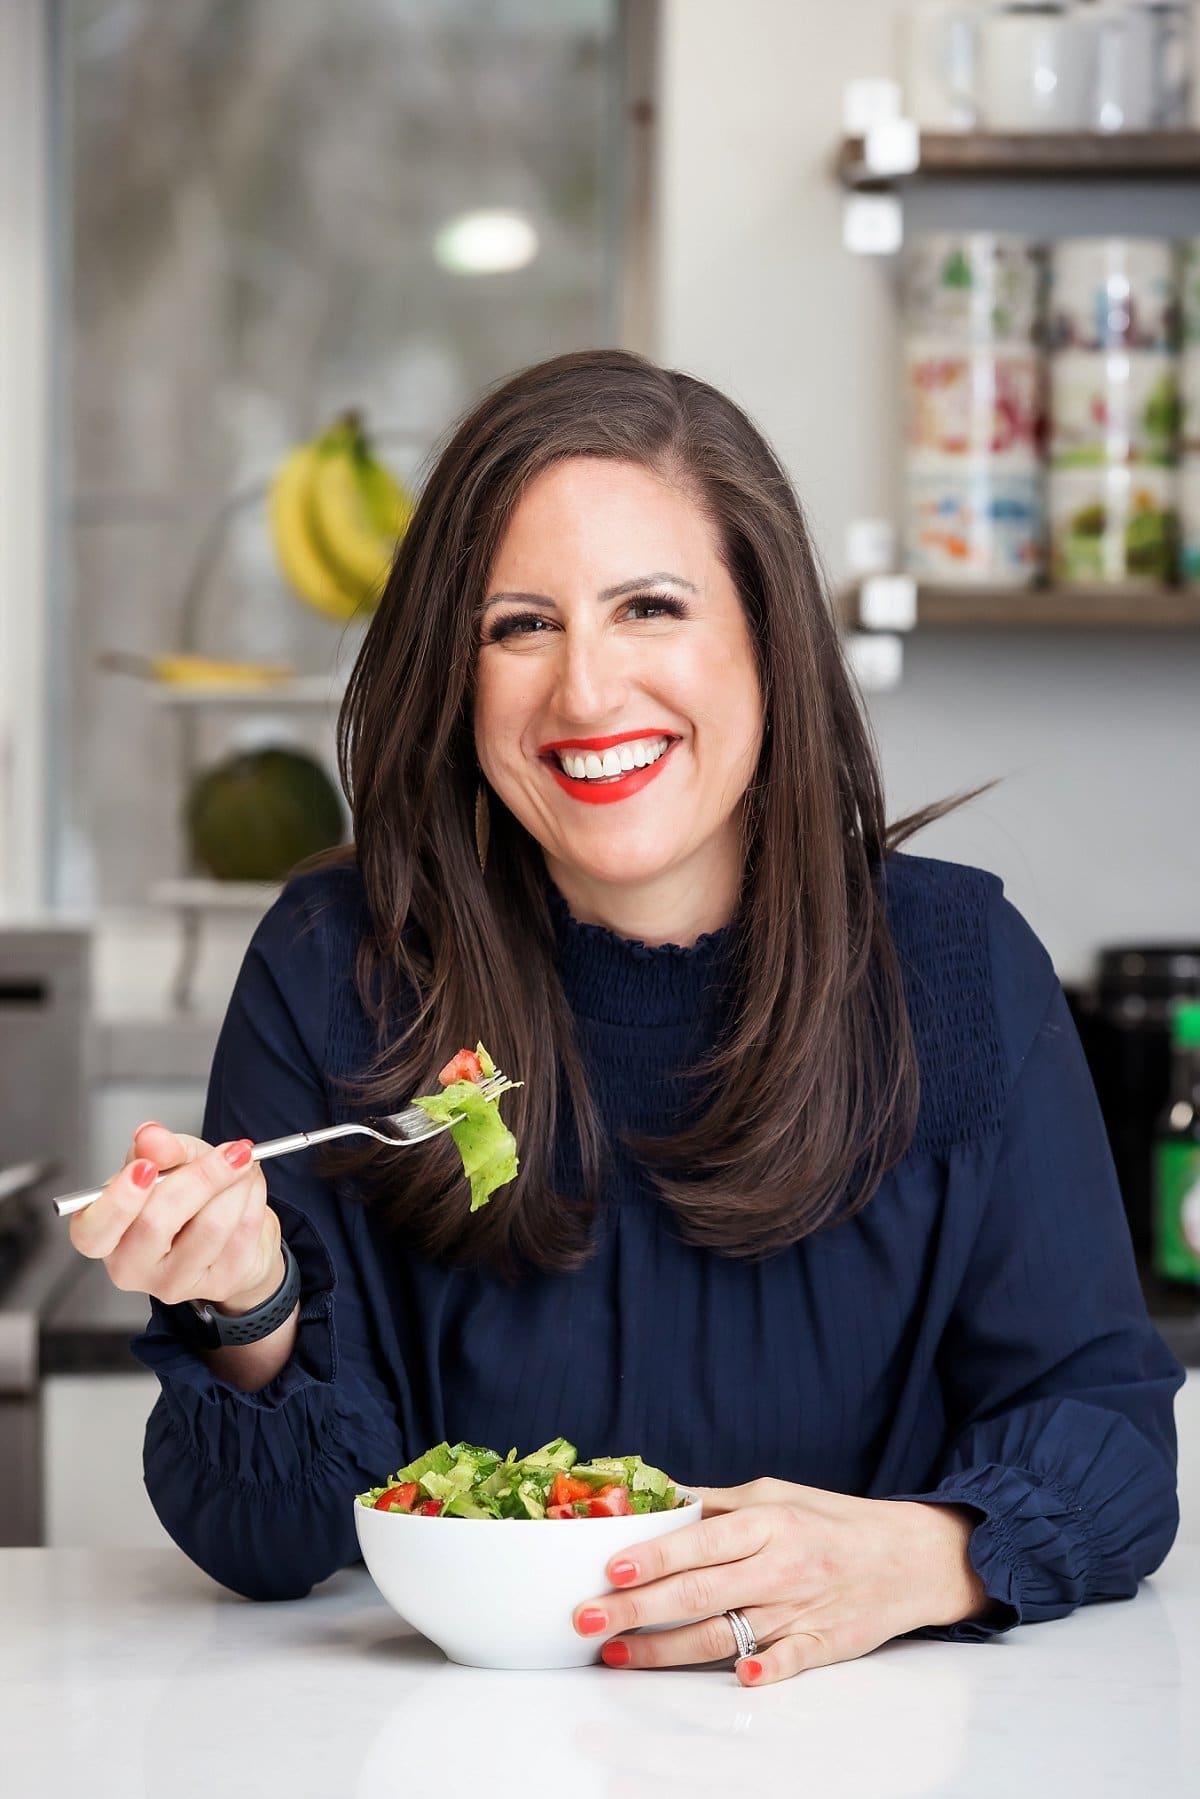 Liz eating syrian salad